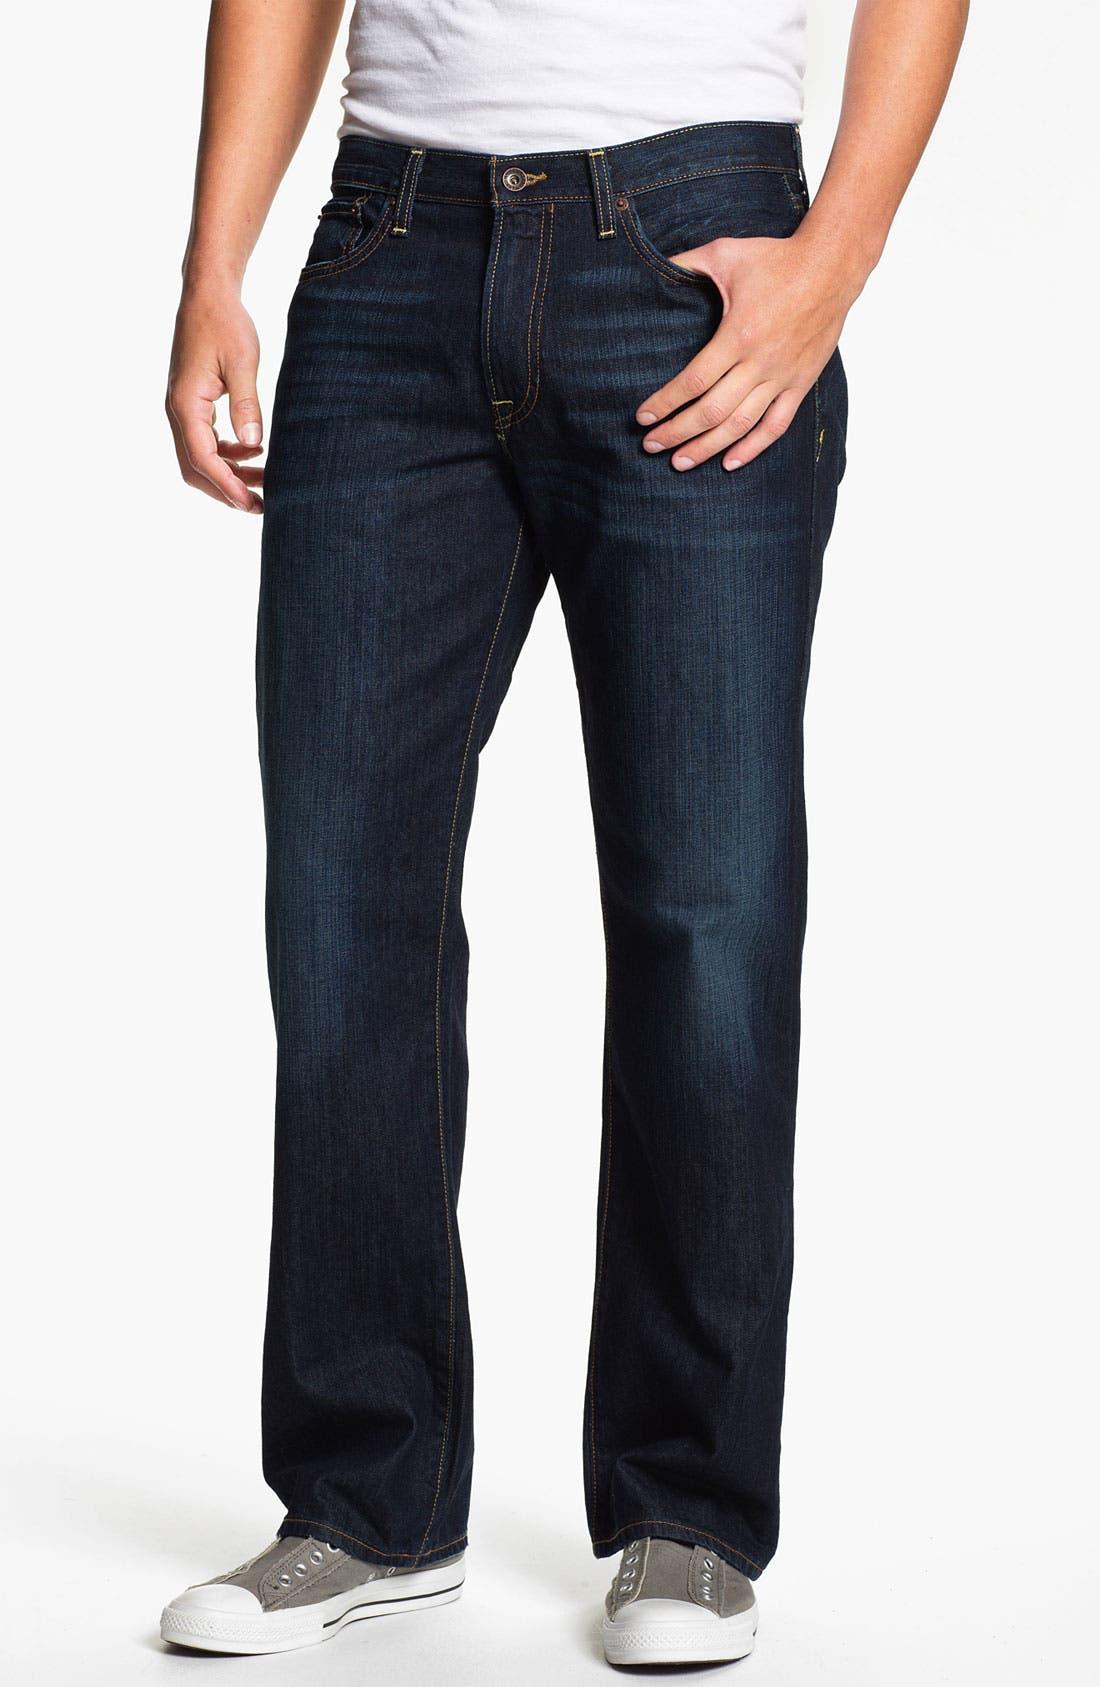 Main Image - Lucky Brand '361 Vintage' Straight Leg Jeans (Ol' Oklahoma)